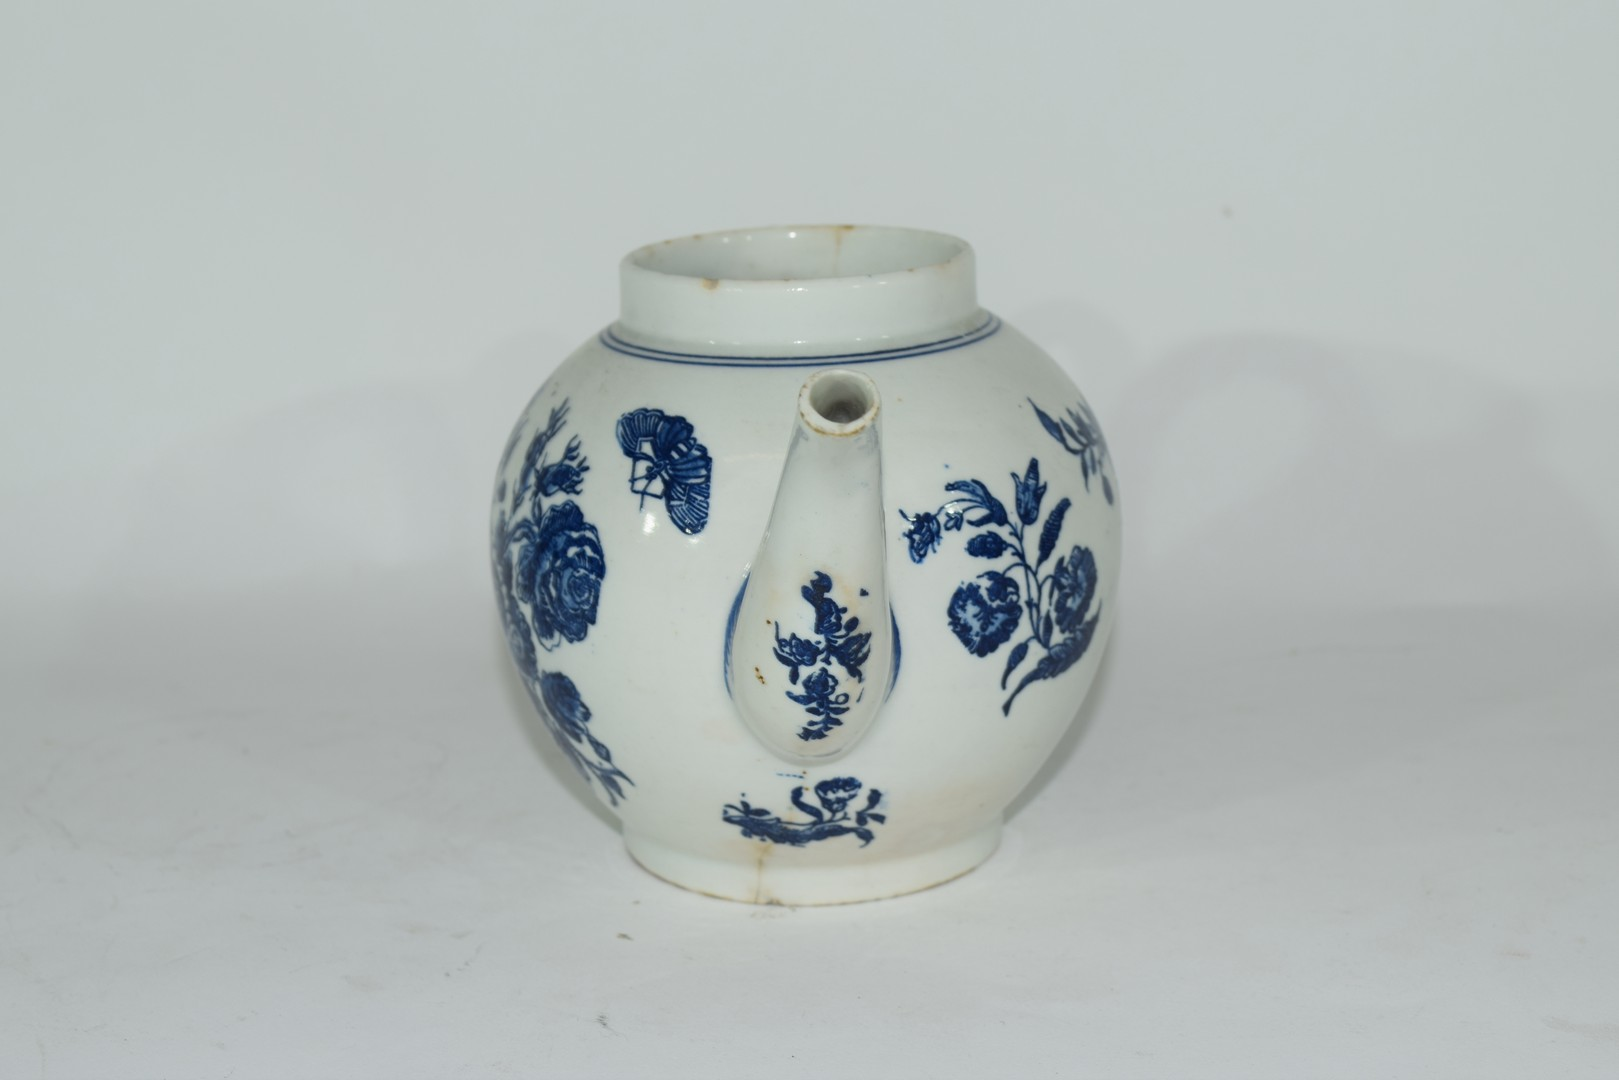 18th century Lowestoft porcelain teapot - Image 2 of 8